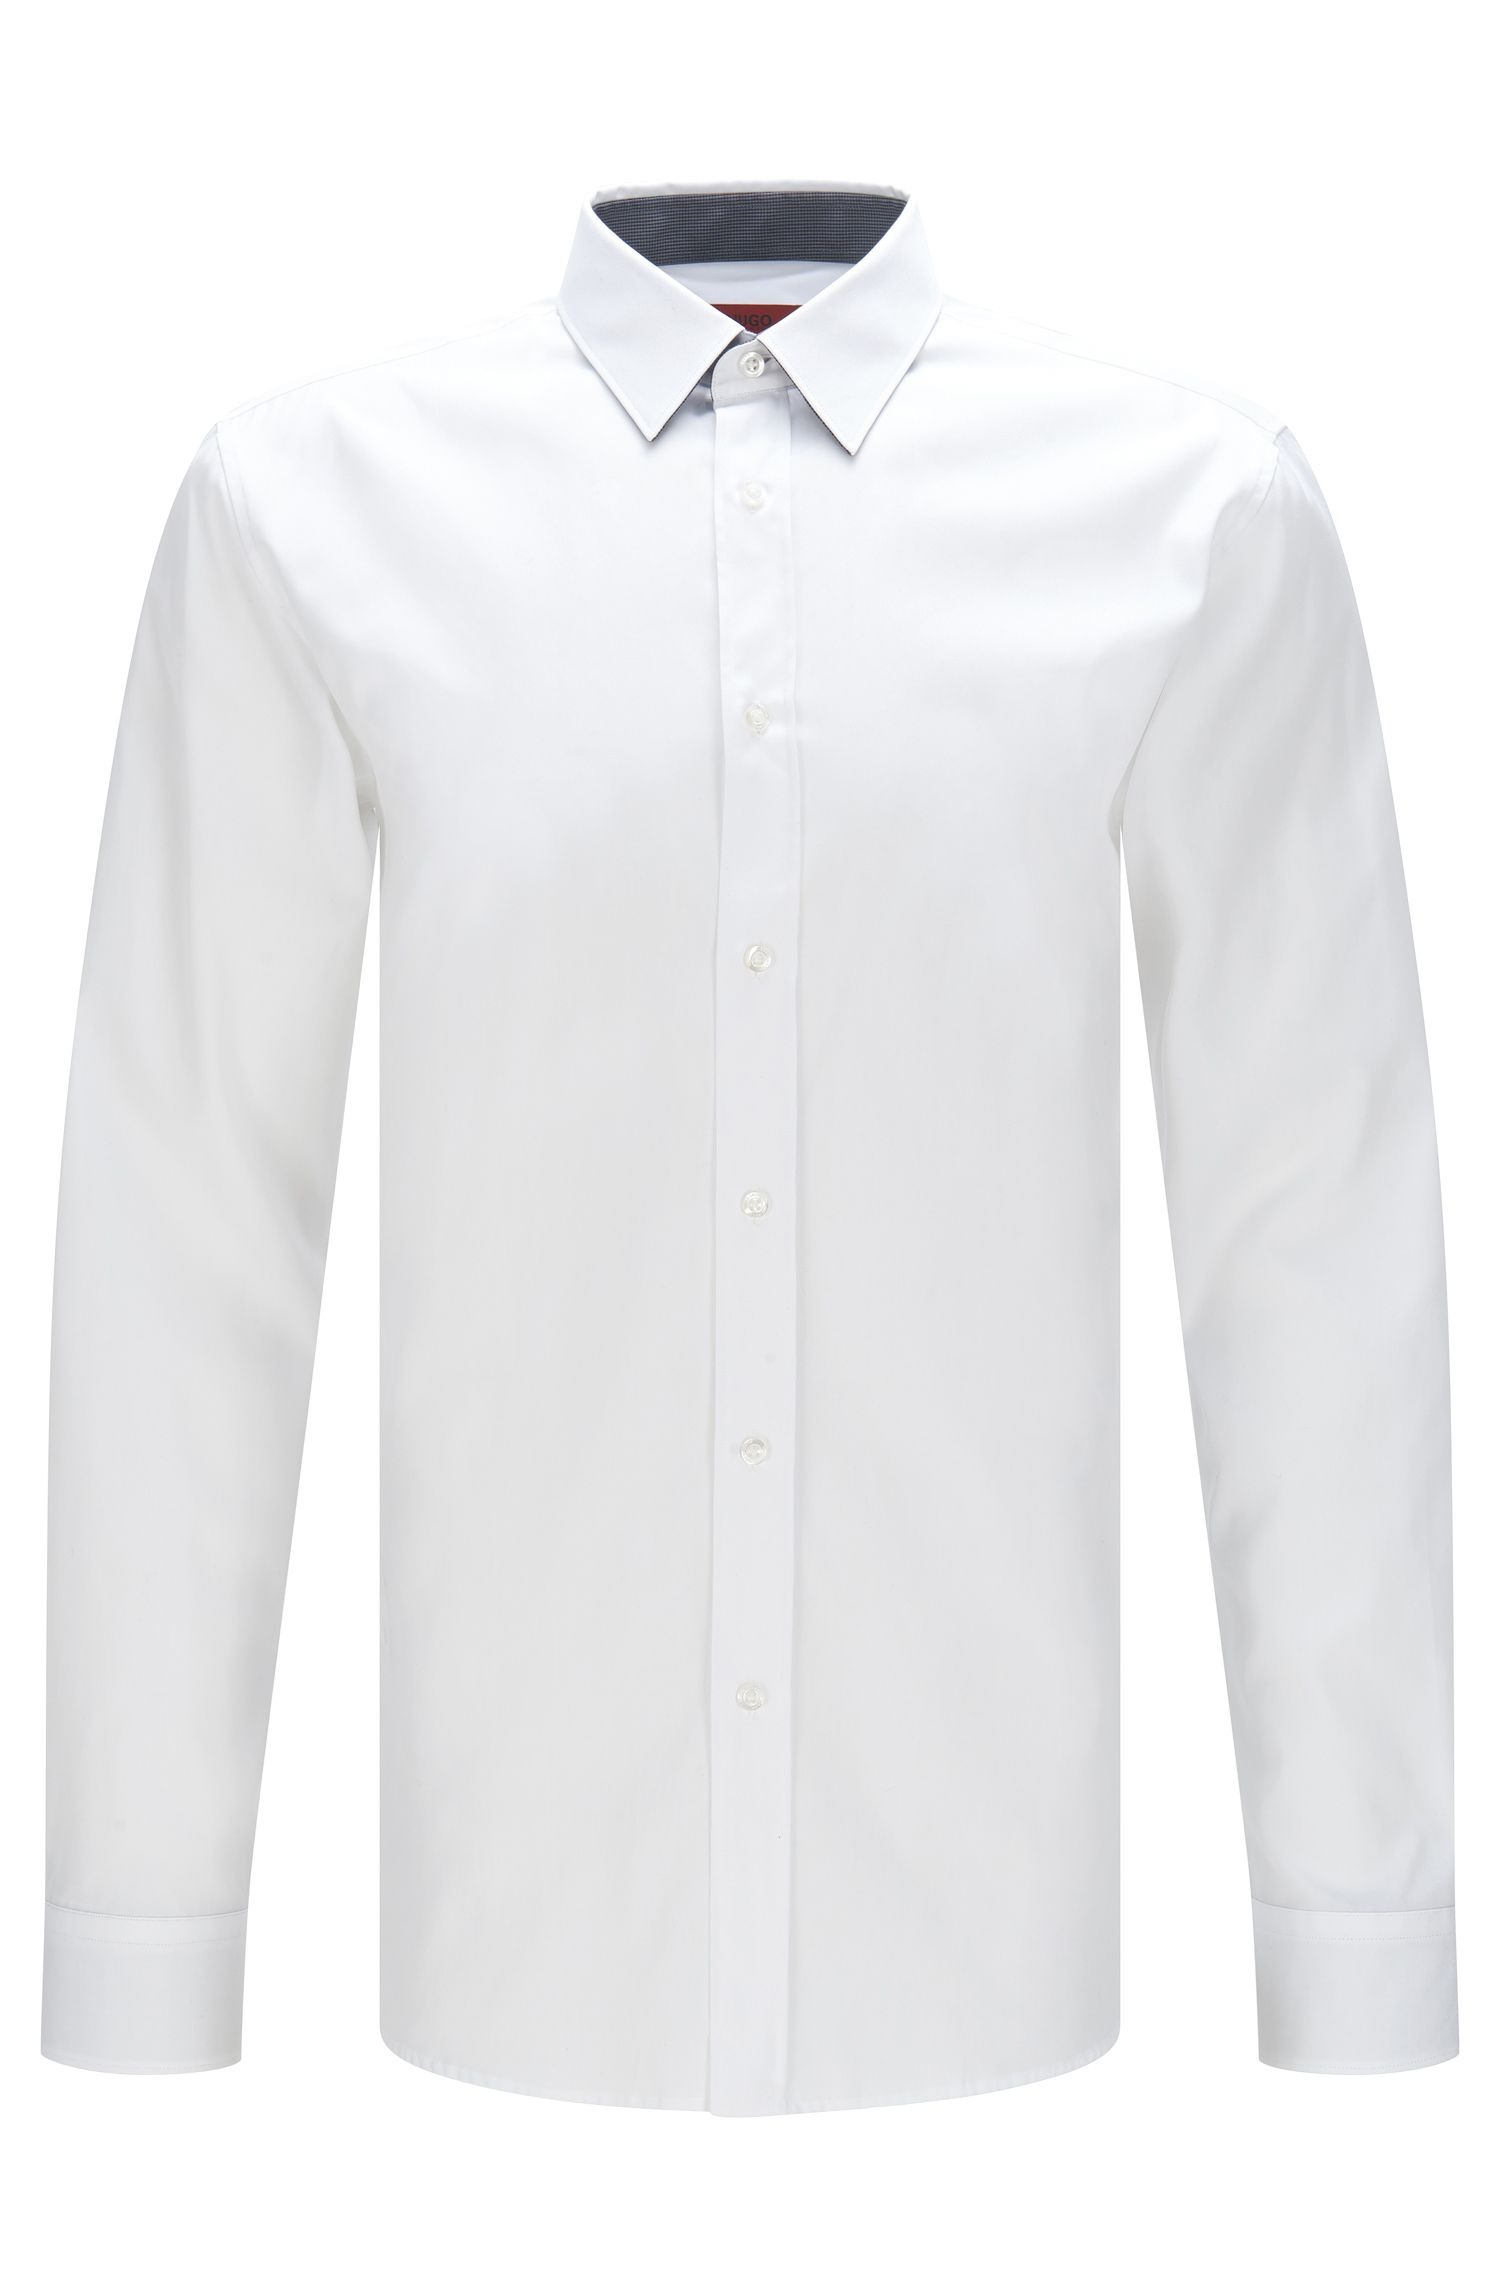 'Elisha' | Extra-Slim Fit, Cotton Easy Iron Button Down Shirt